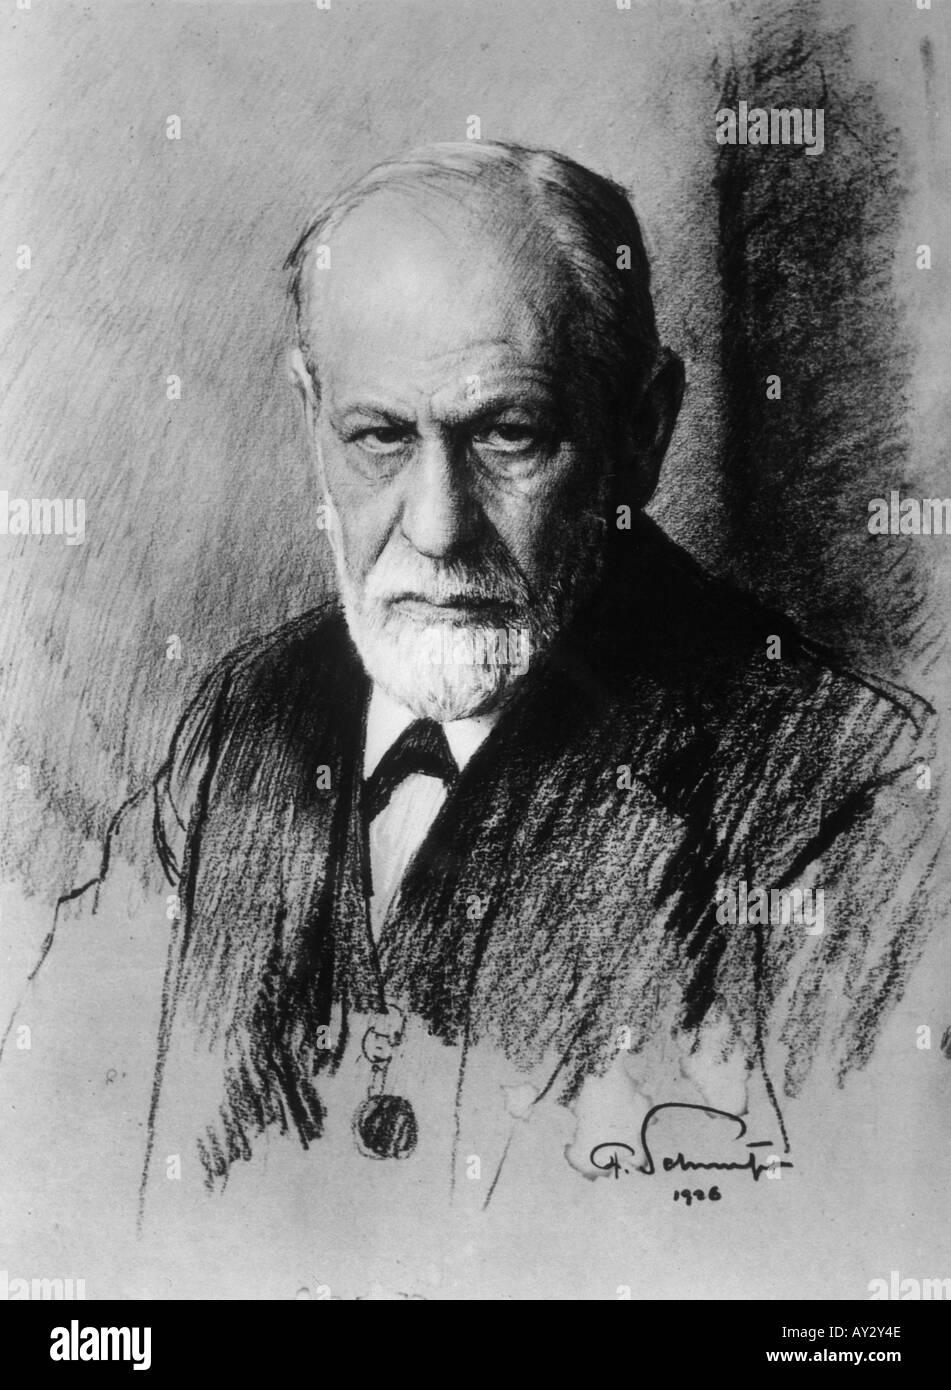 Sigmund Freud 1926 Neg13 - Stock Image